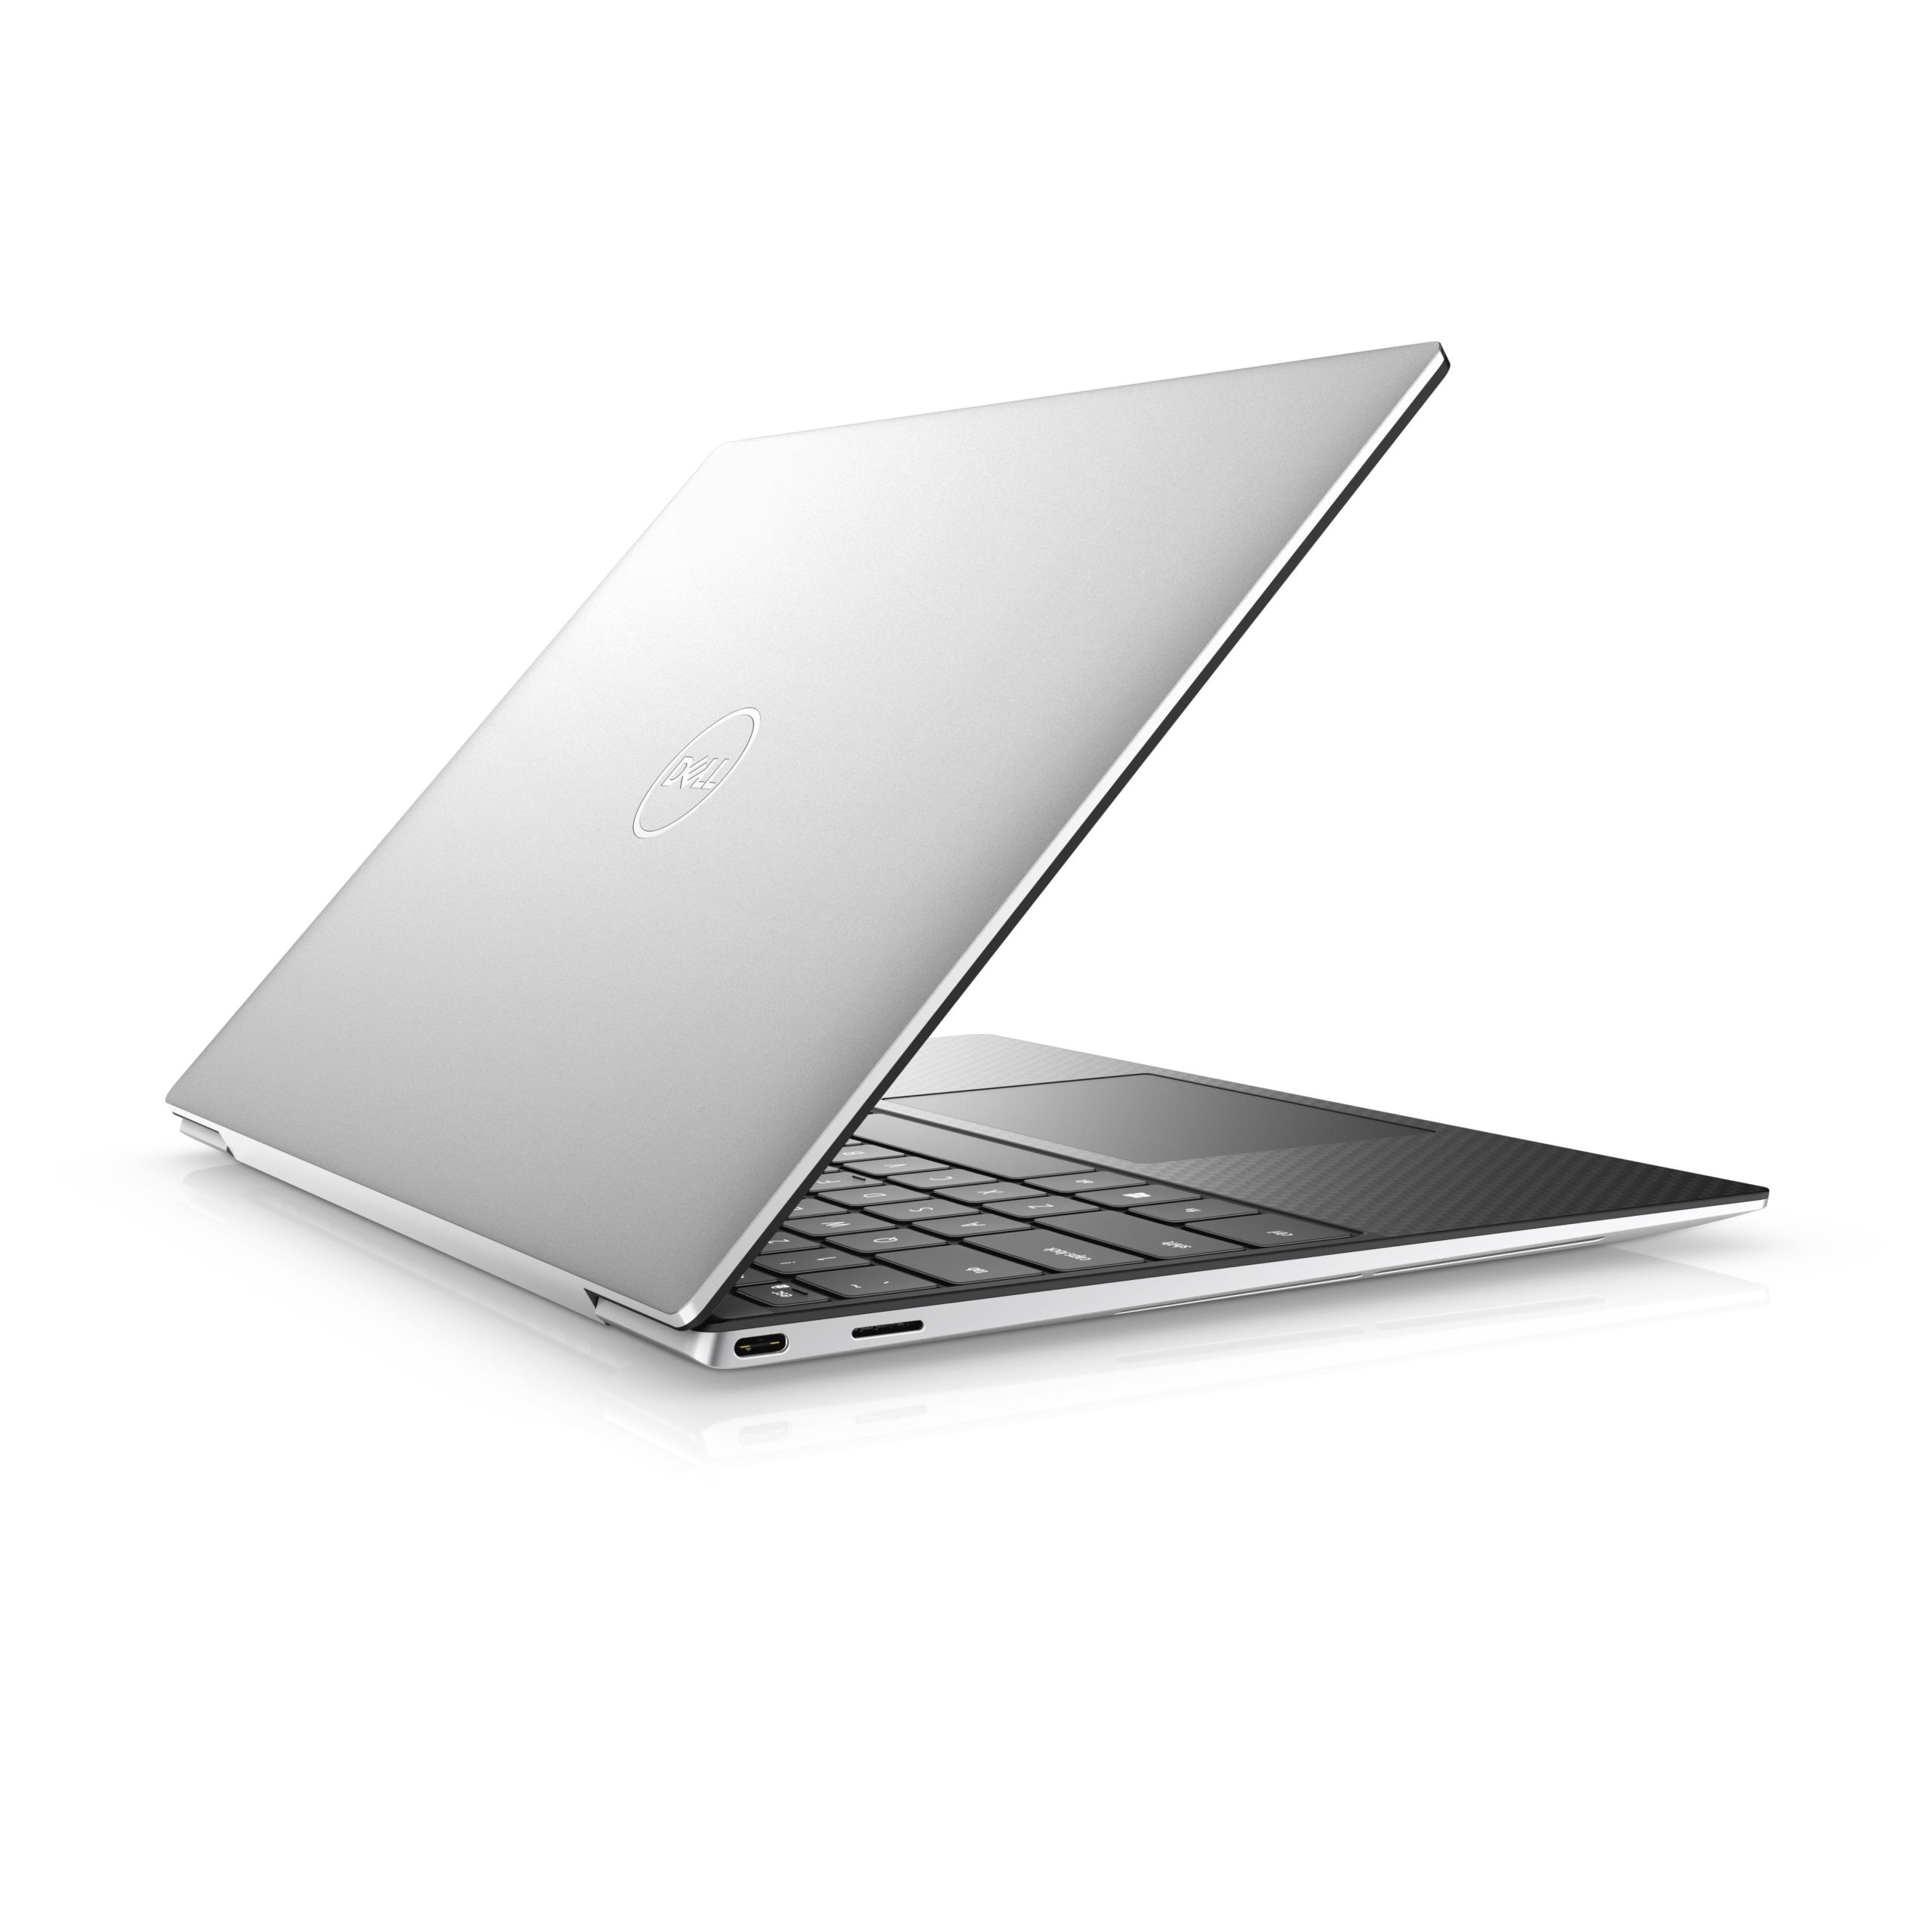 Dell XPS 13 9310 i5 1135G7 8GB RAM 256GB SSD